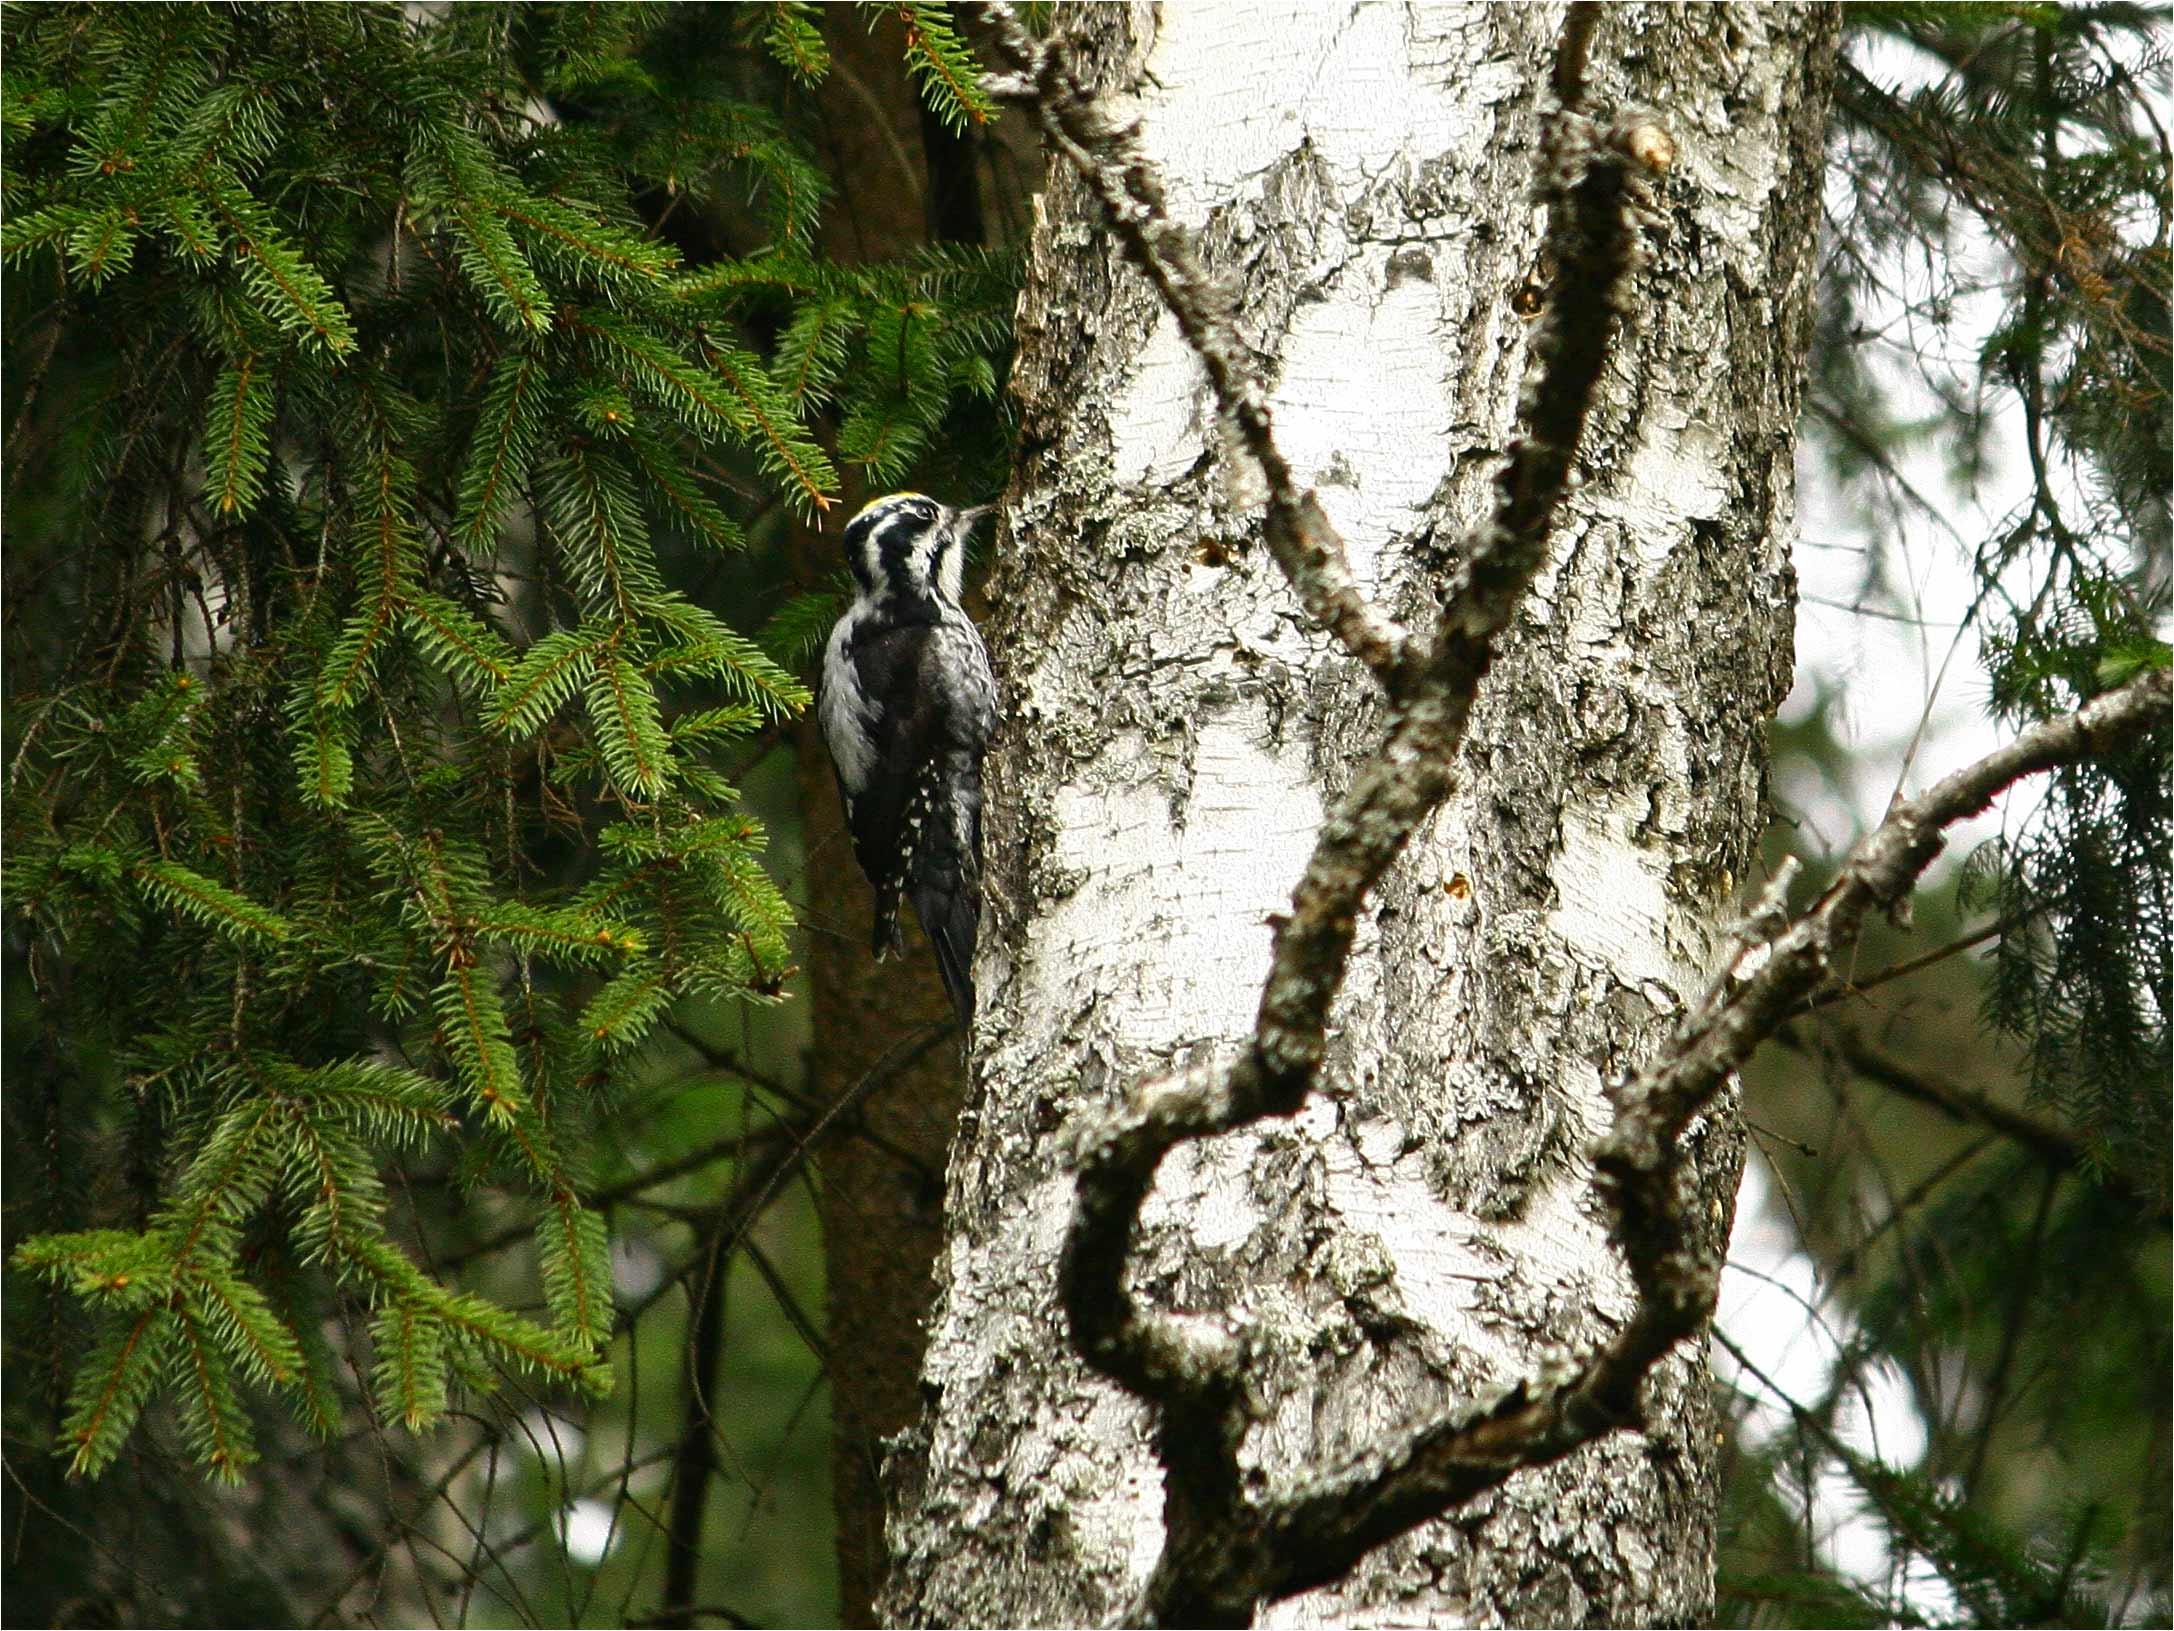 Трёхпалый дятел (Picoides tridactylus). Автор фото: Кудрявцева Татьяна